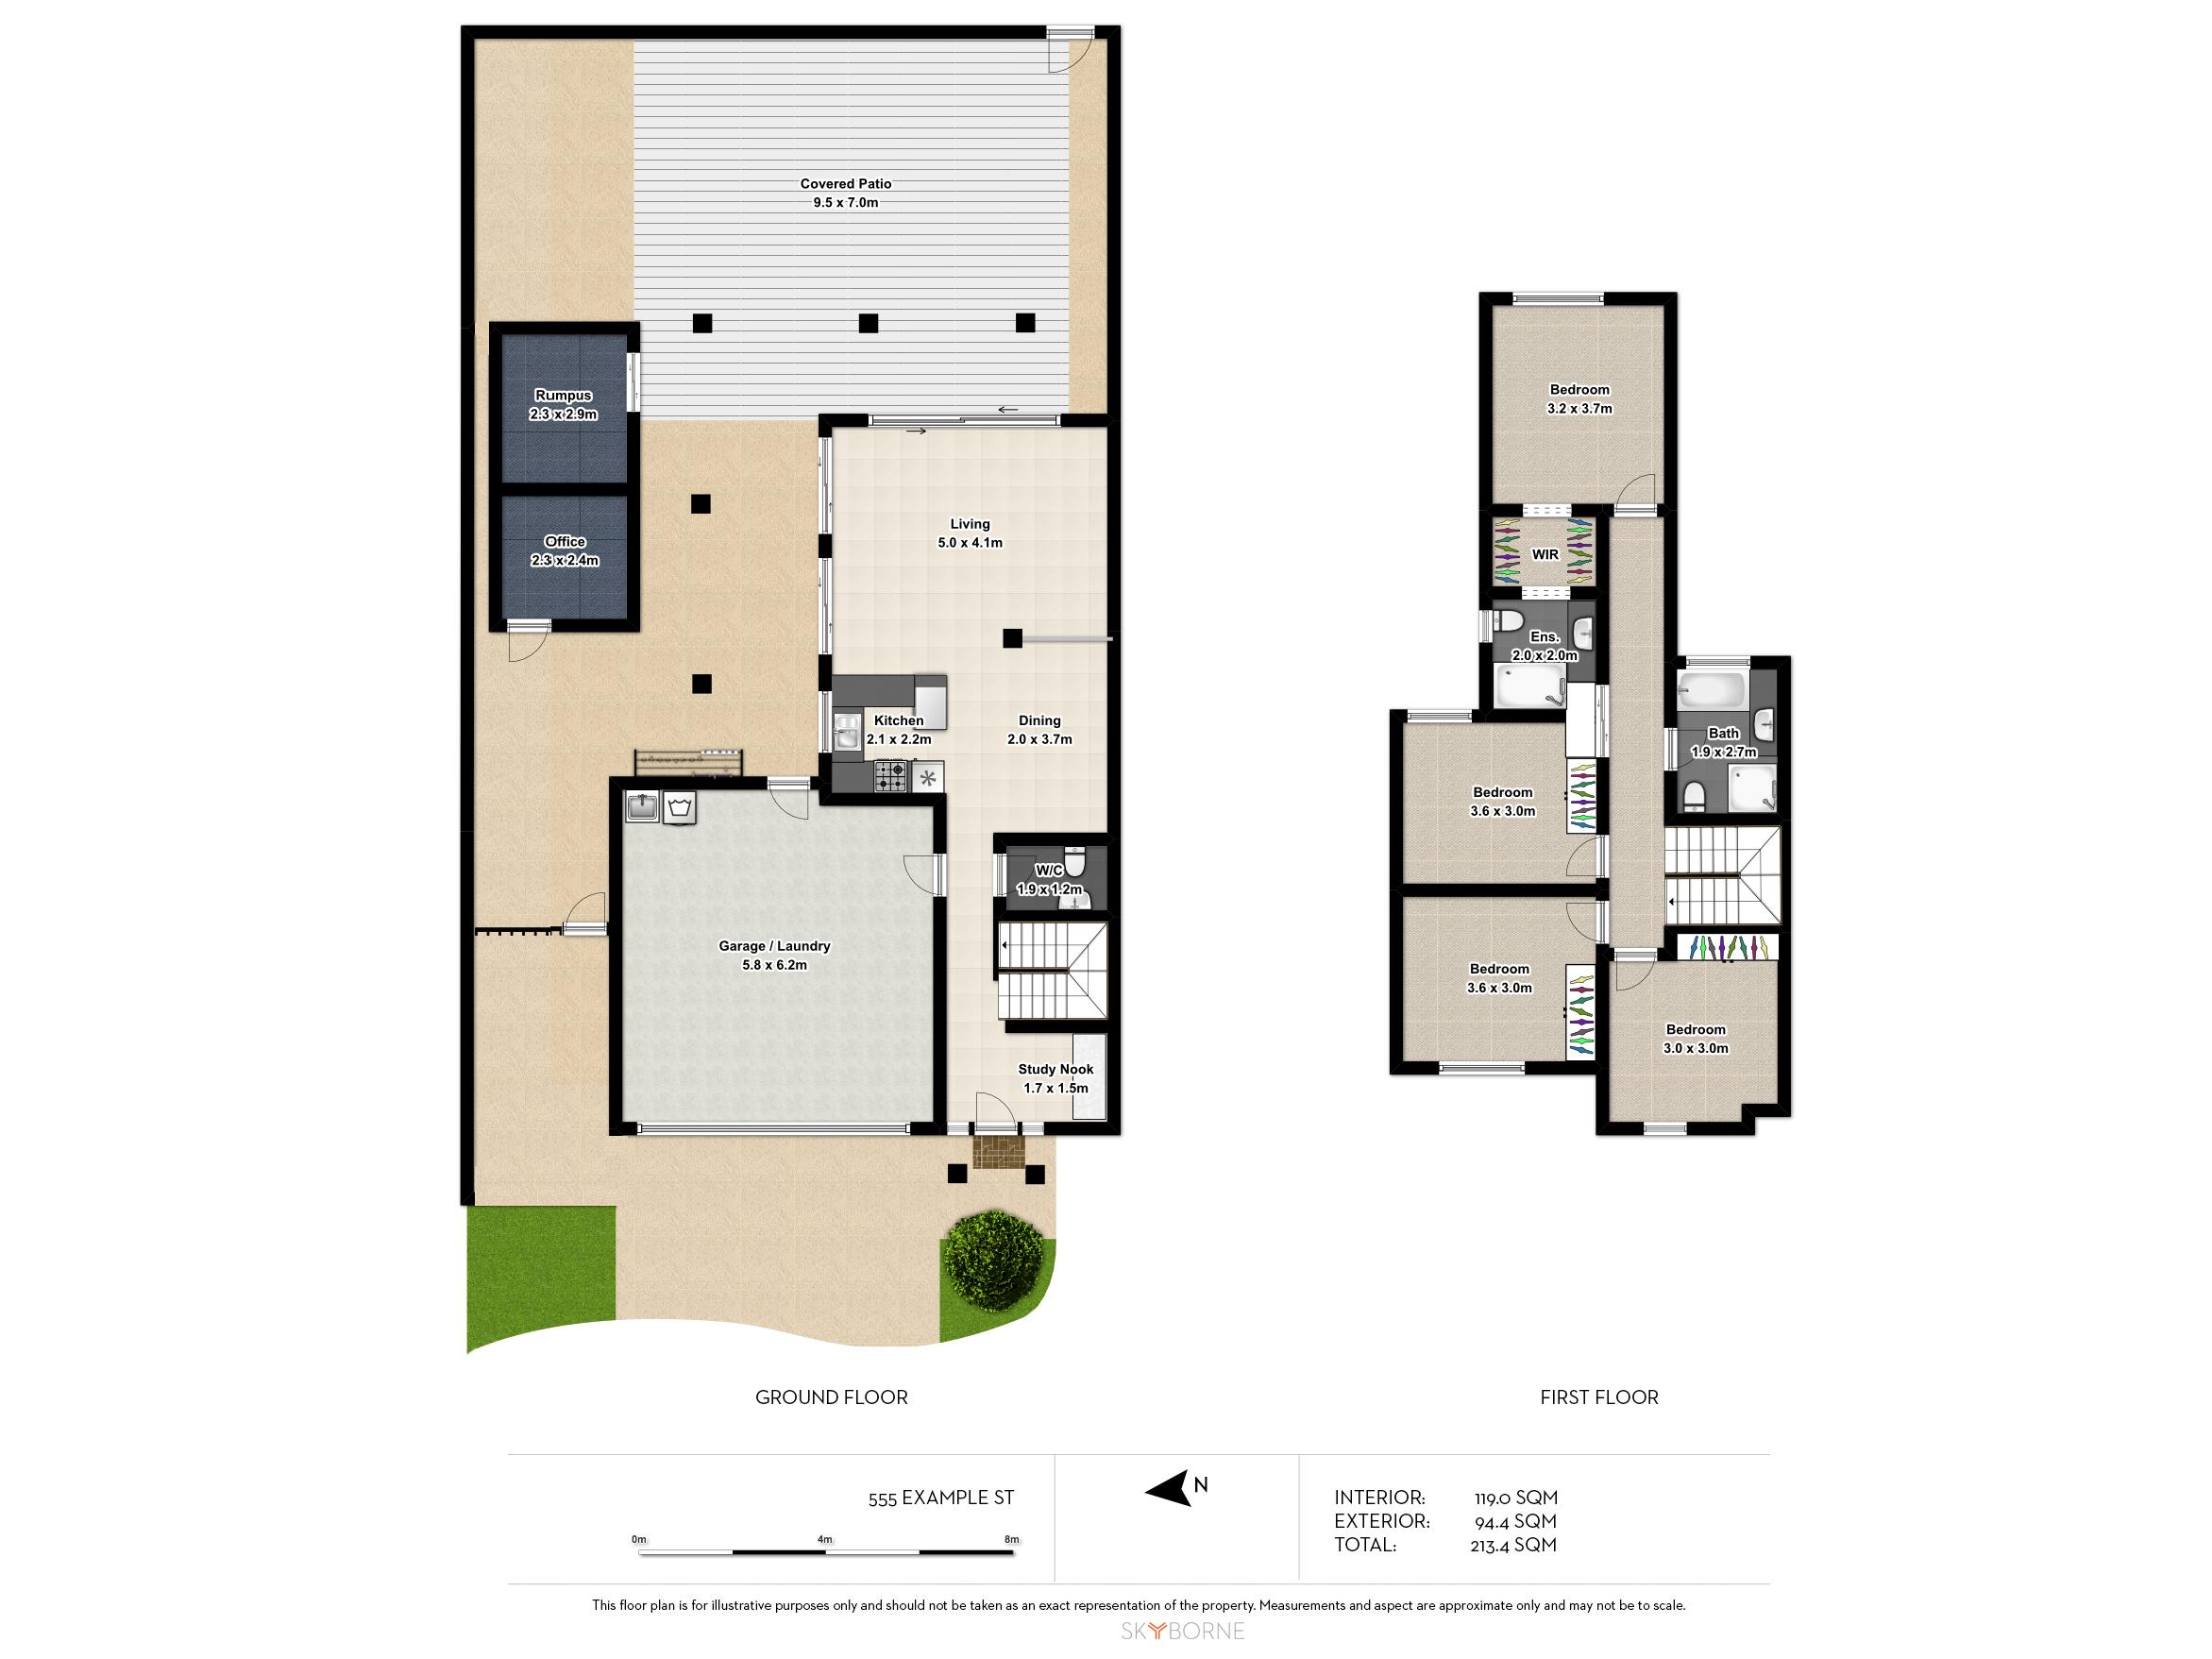 Skyborne_Floorplan_2.jpg